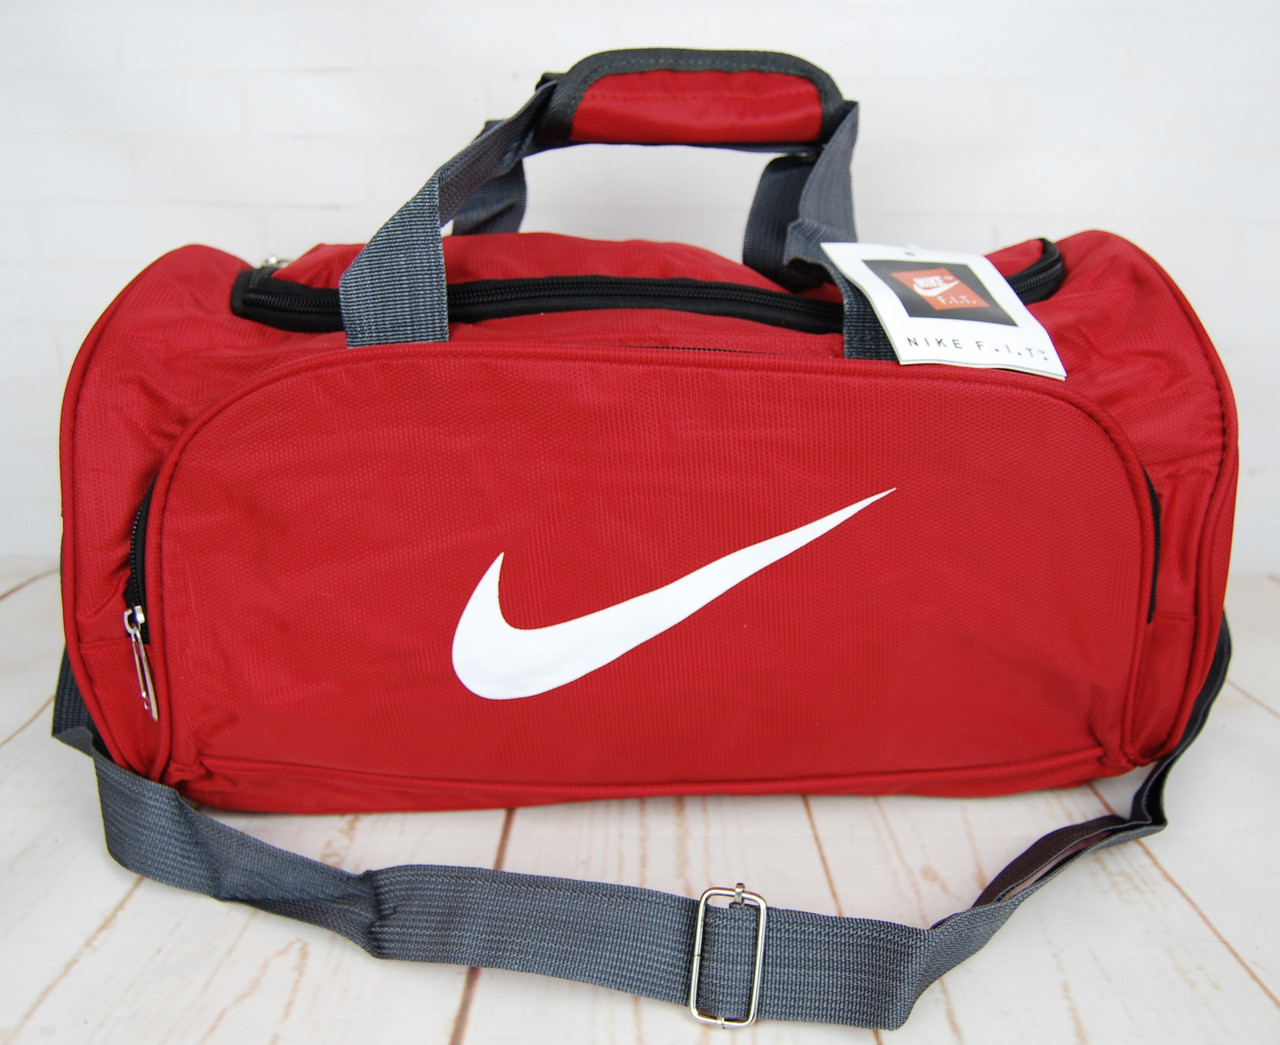 37bfa7c0ba10 Маленькая спортивная сумка NIKE Сумка Найк. КСС10-1: продажа, цена в ...